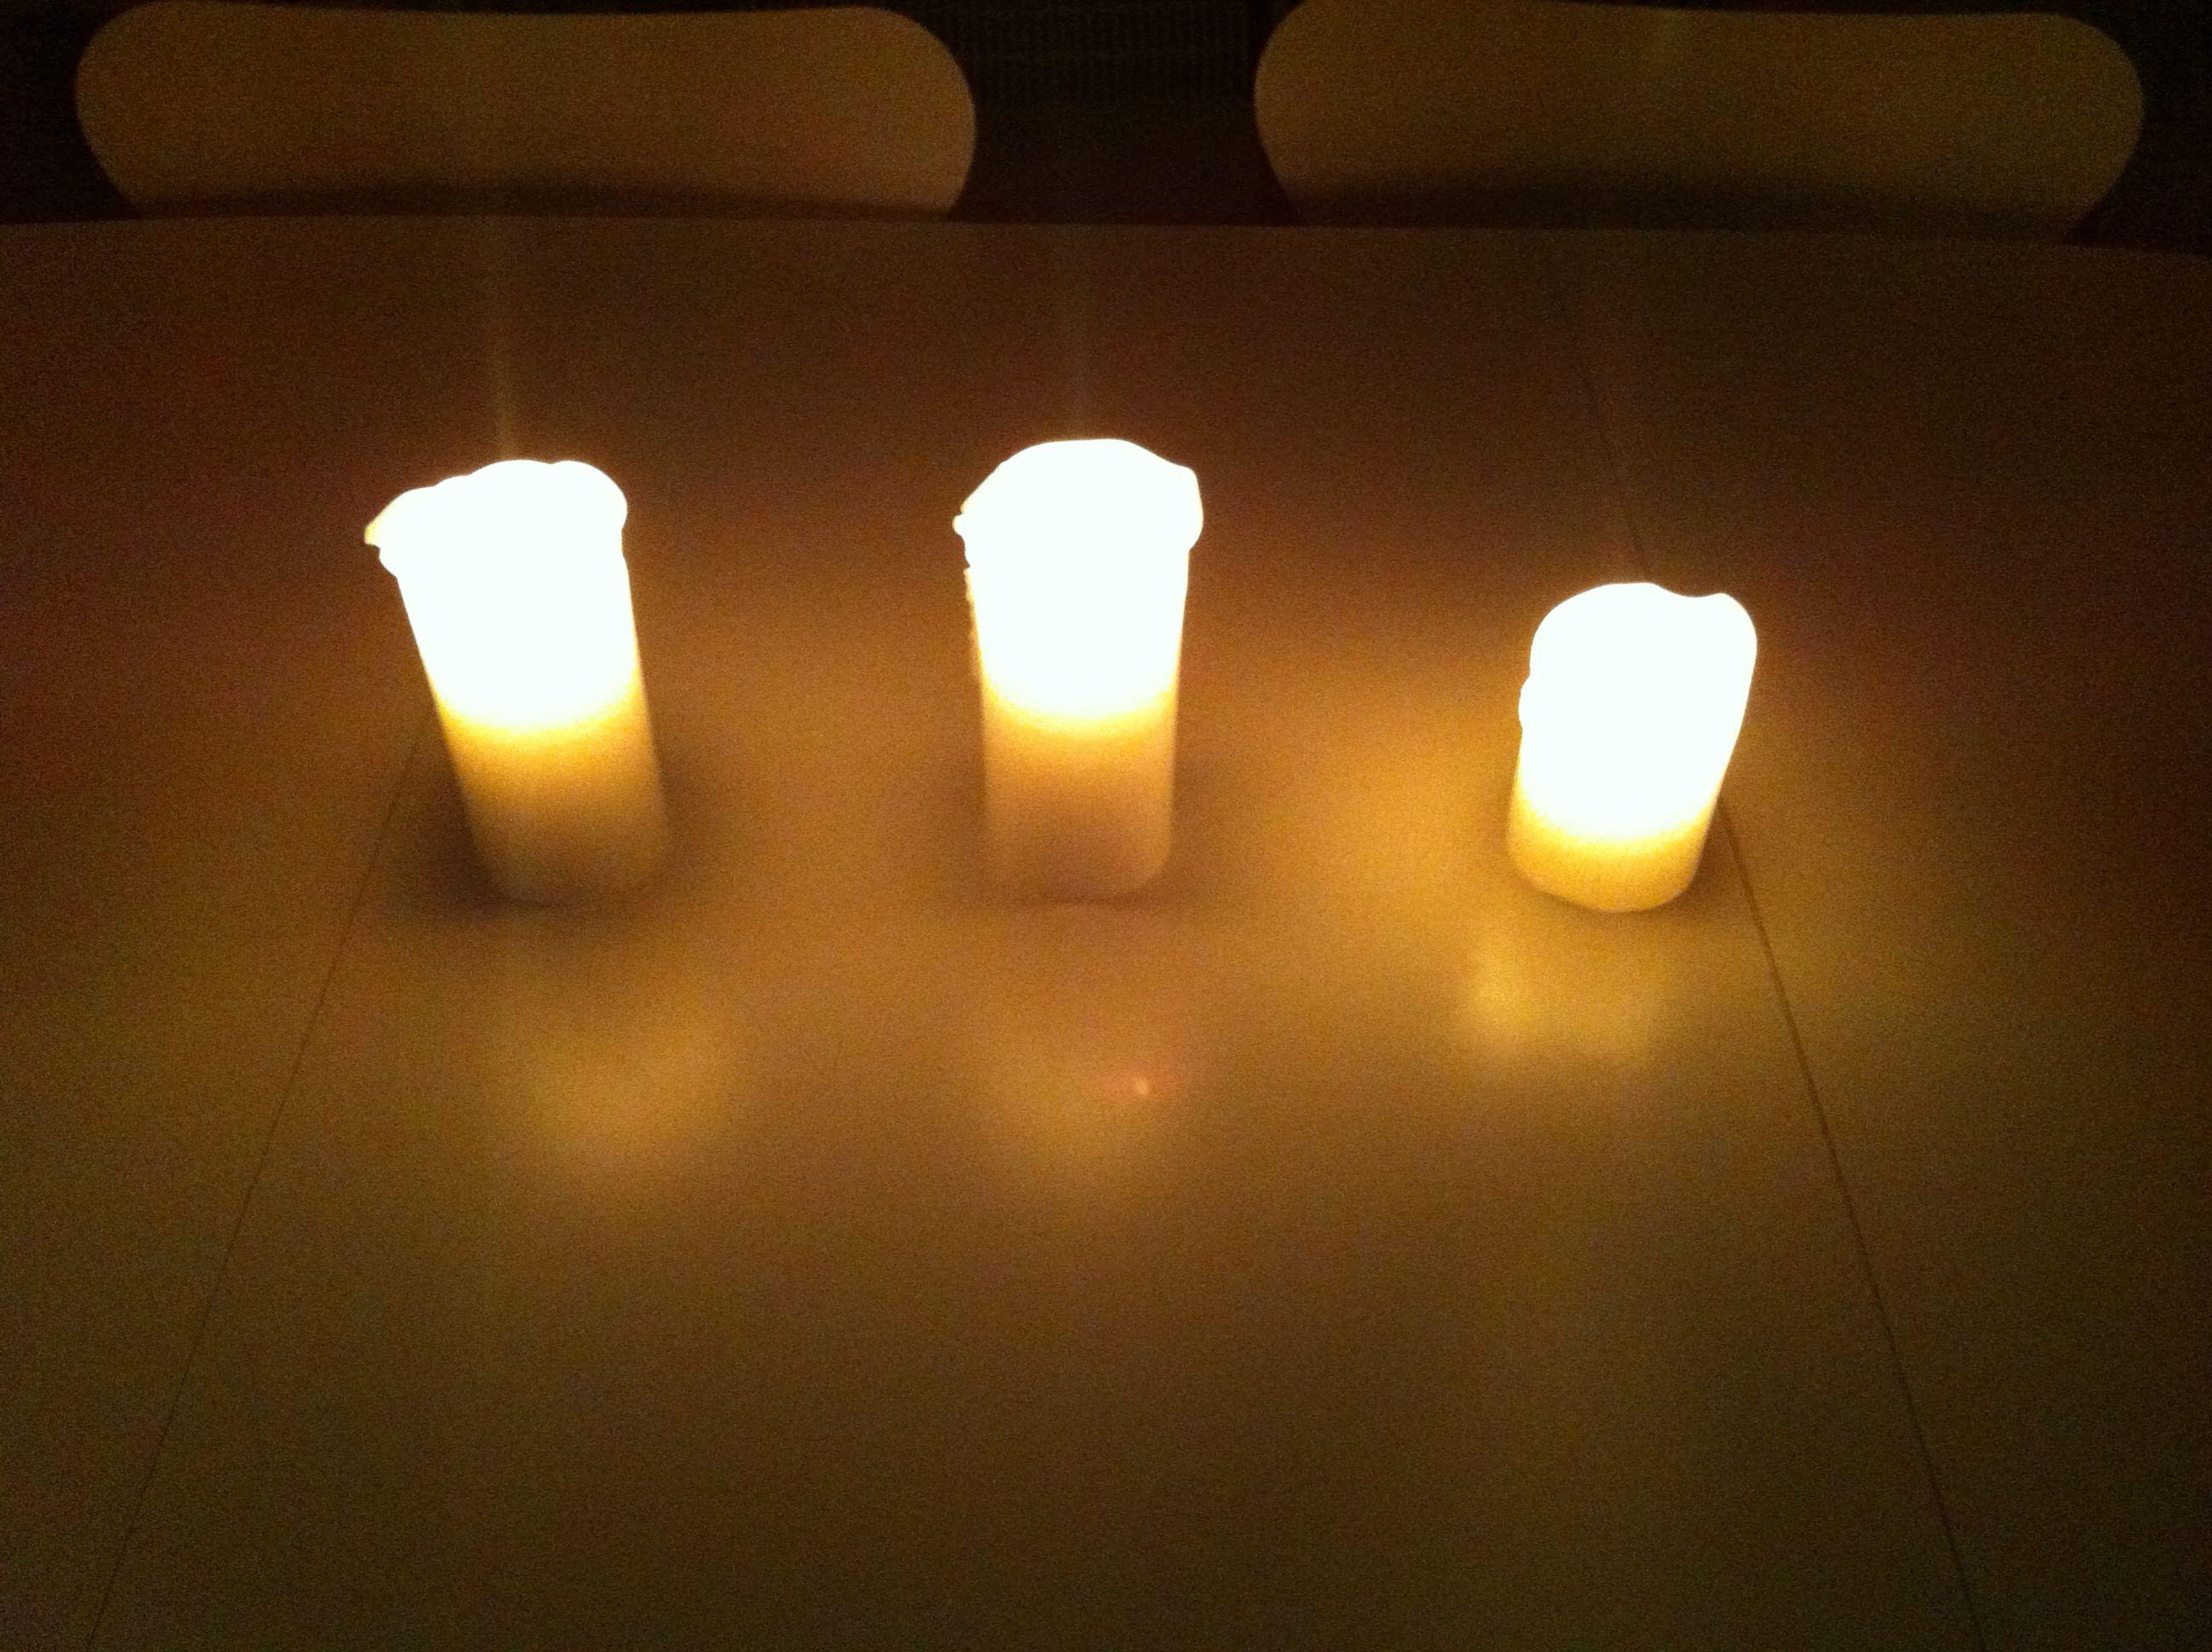 watching the deep glow create some skandinavisk hygge